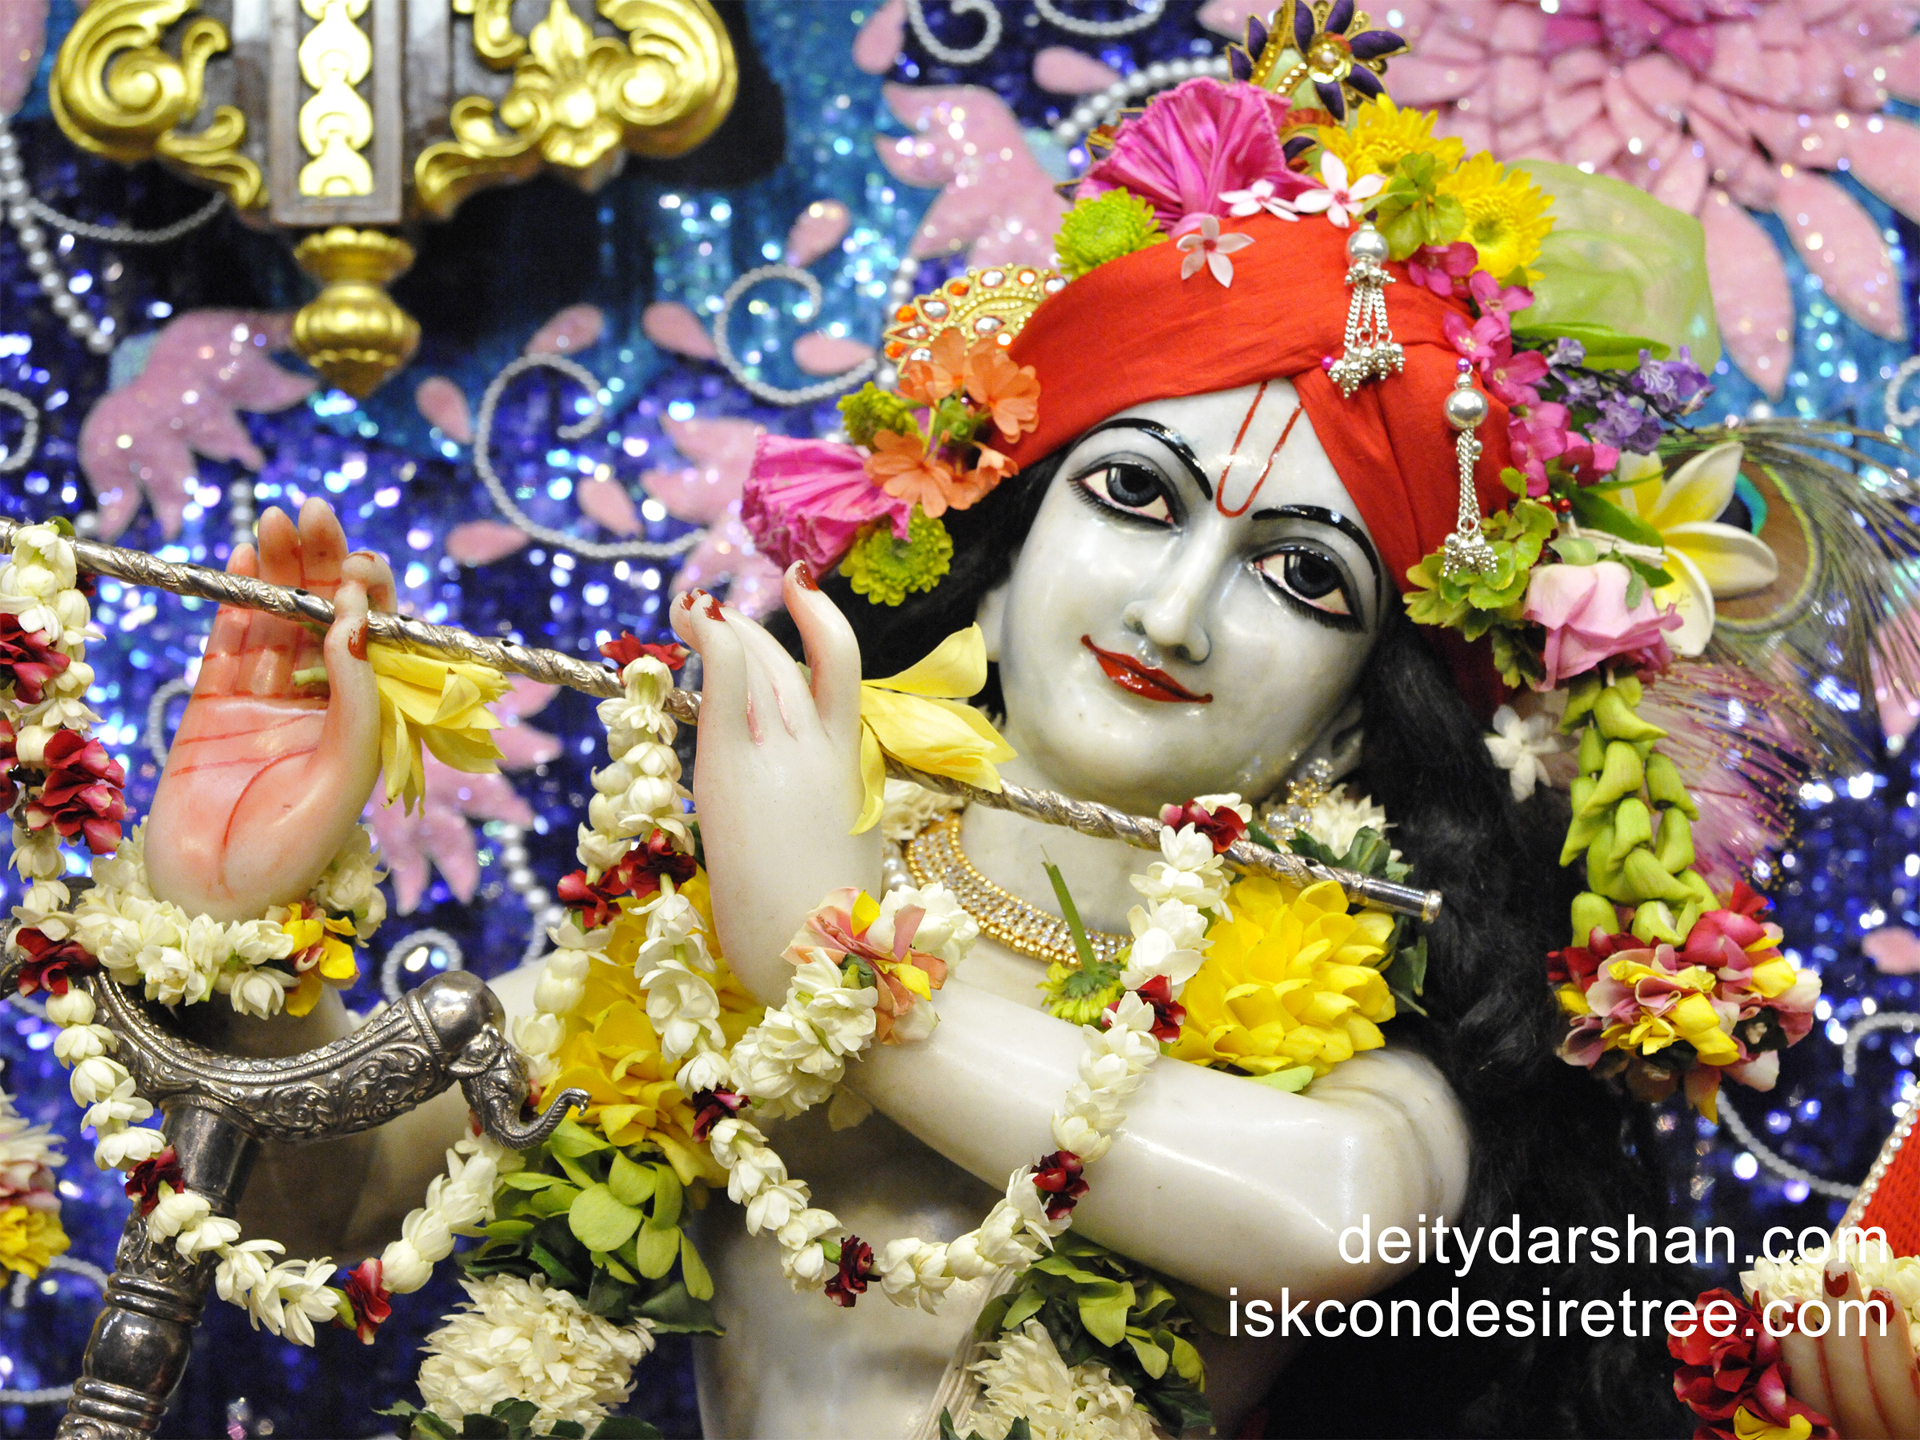 Sri Gopinath Close up Wallpaper (057) Size 1920x1440 Download